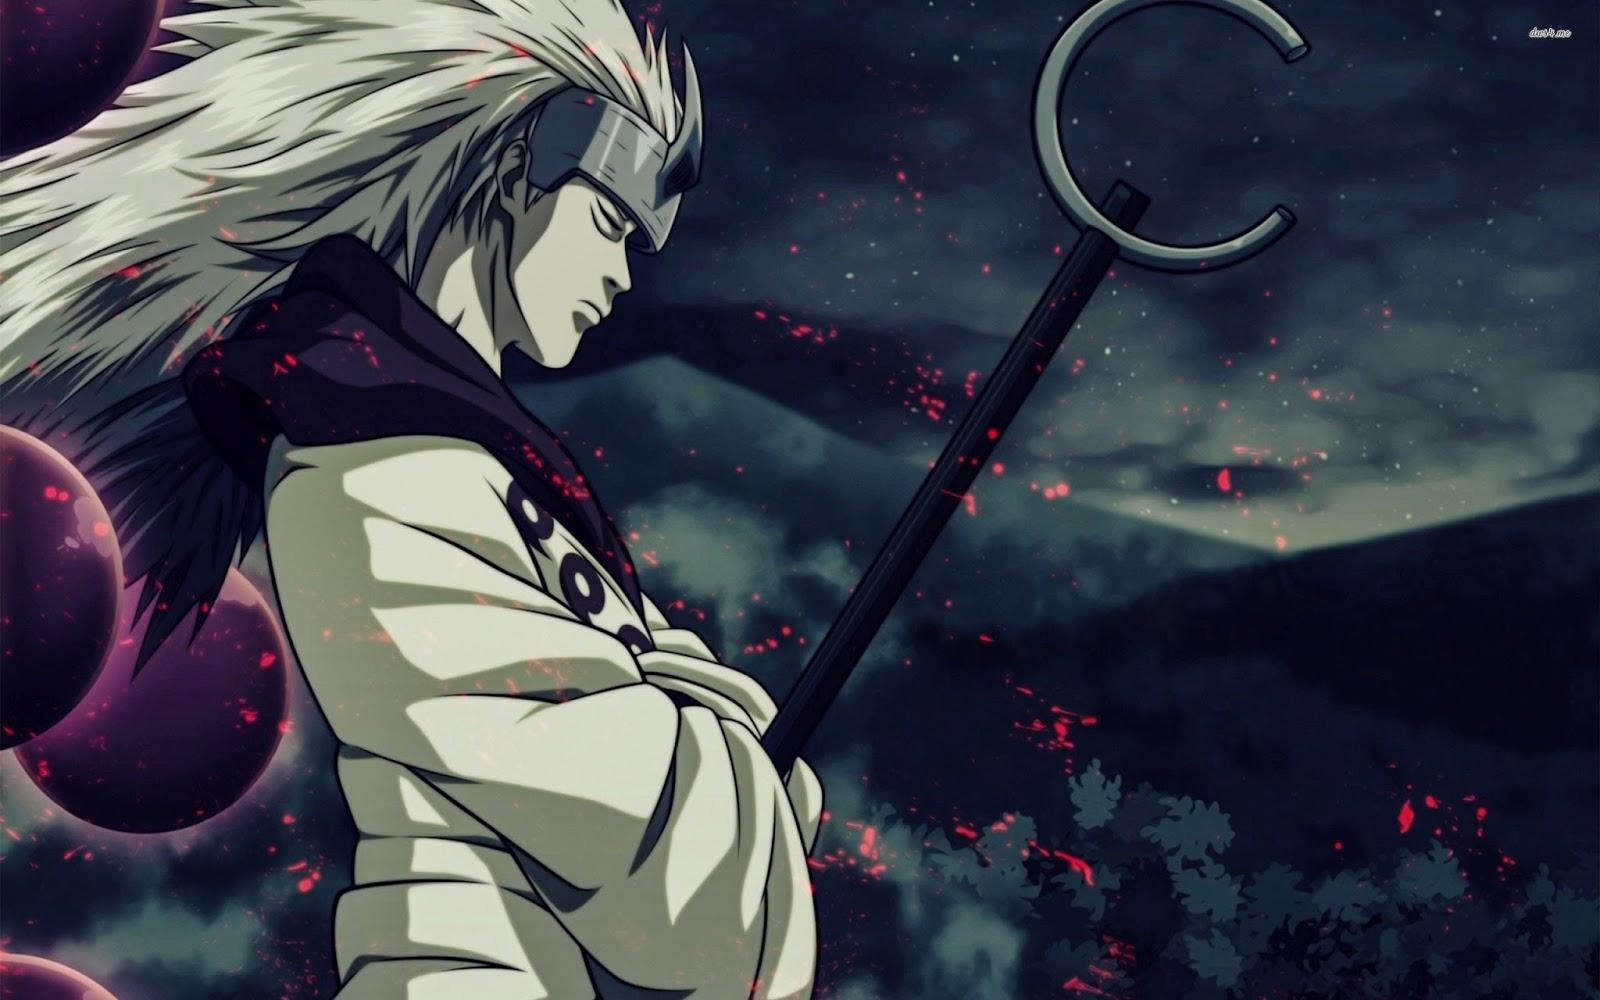 Cool Wallpaper High Quality Naruto - wallpaper-keren-naruto-21  You Should Have_626850.jpg